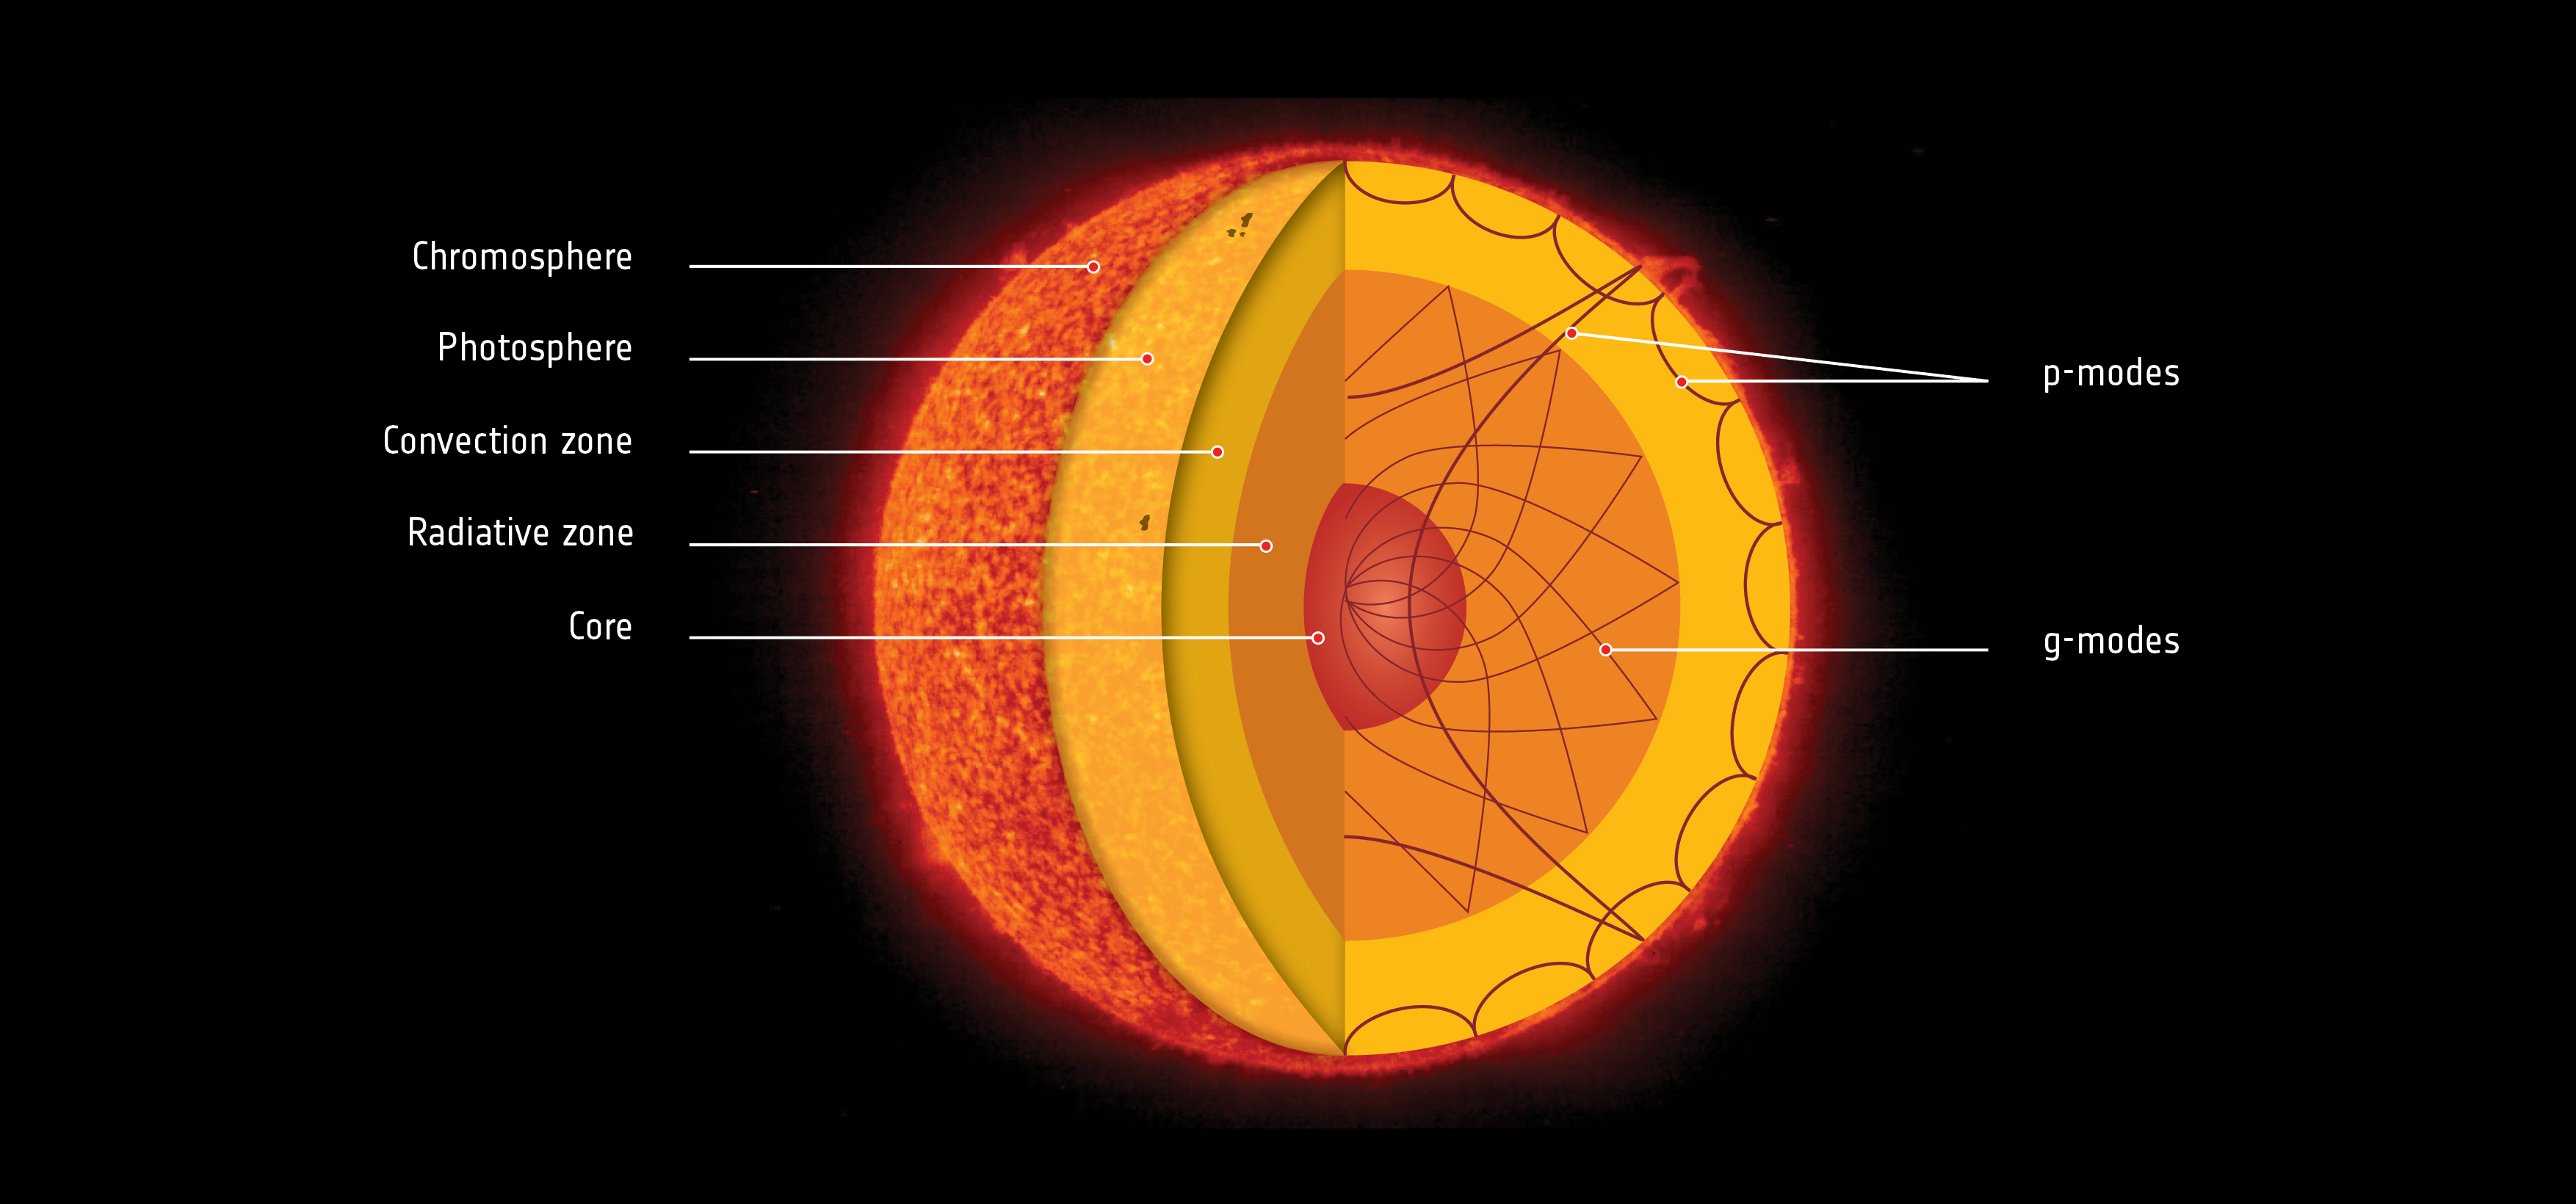 Soho reveals rapidly rotating solar core nasa cross section diagram of the sun pooptronica